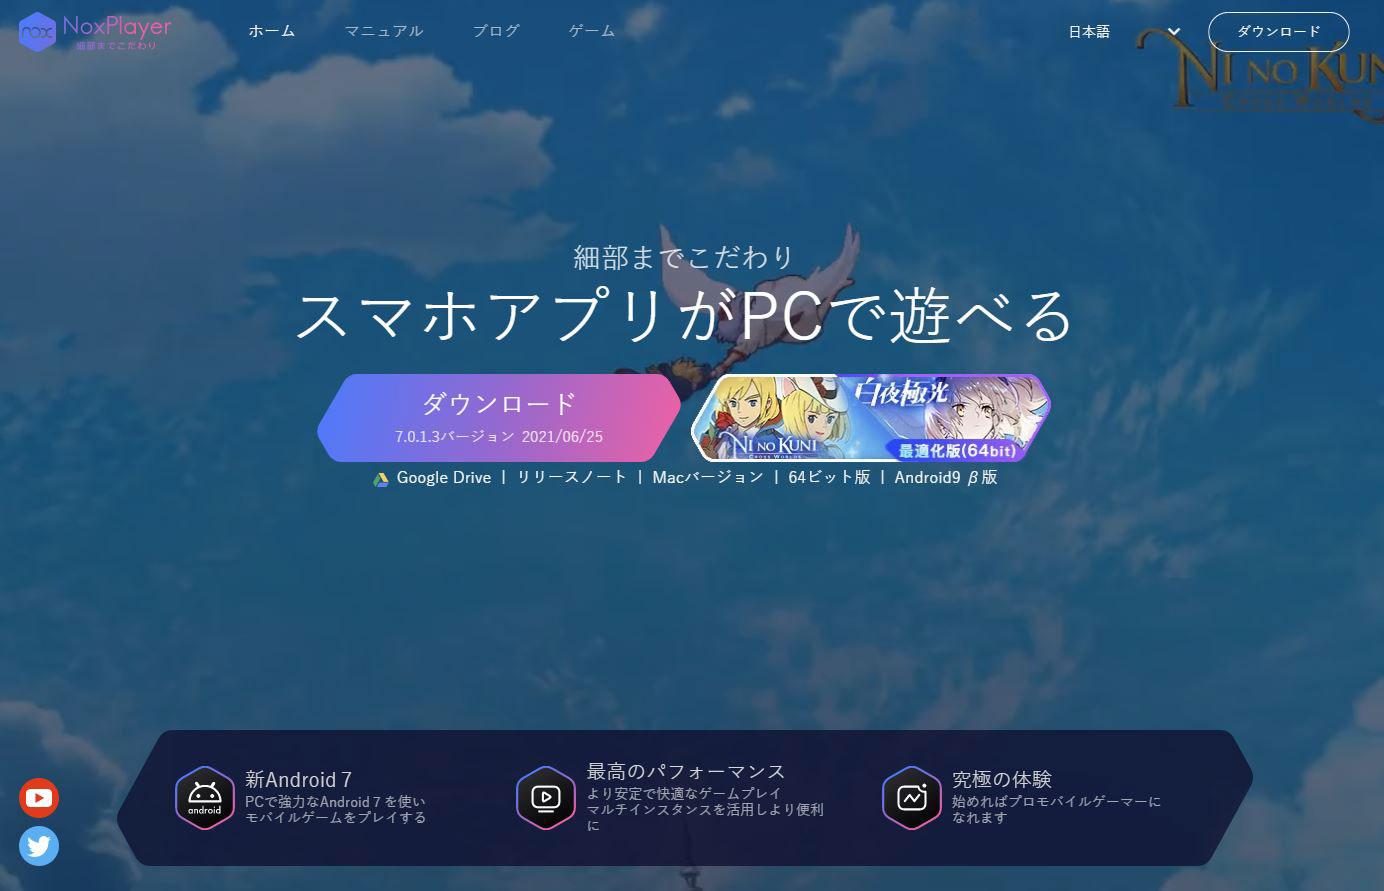 NoxPlayer公式サイト